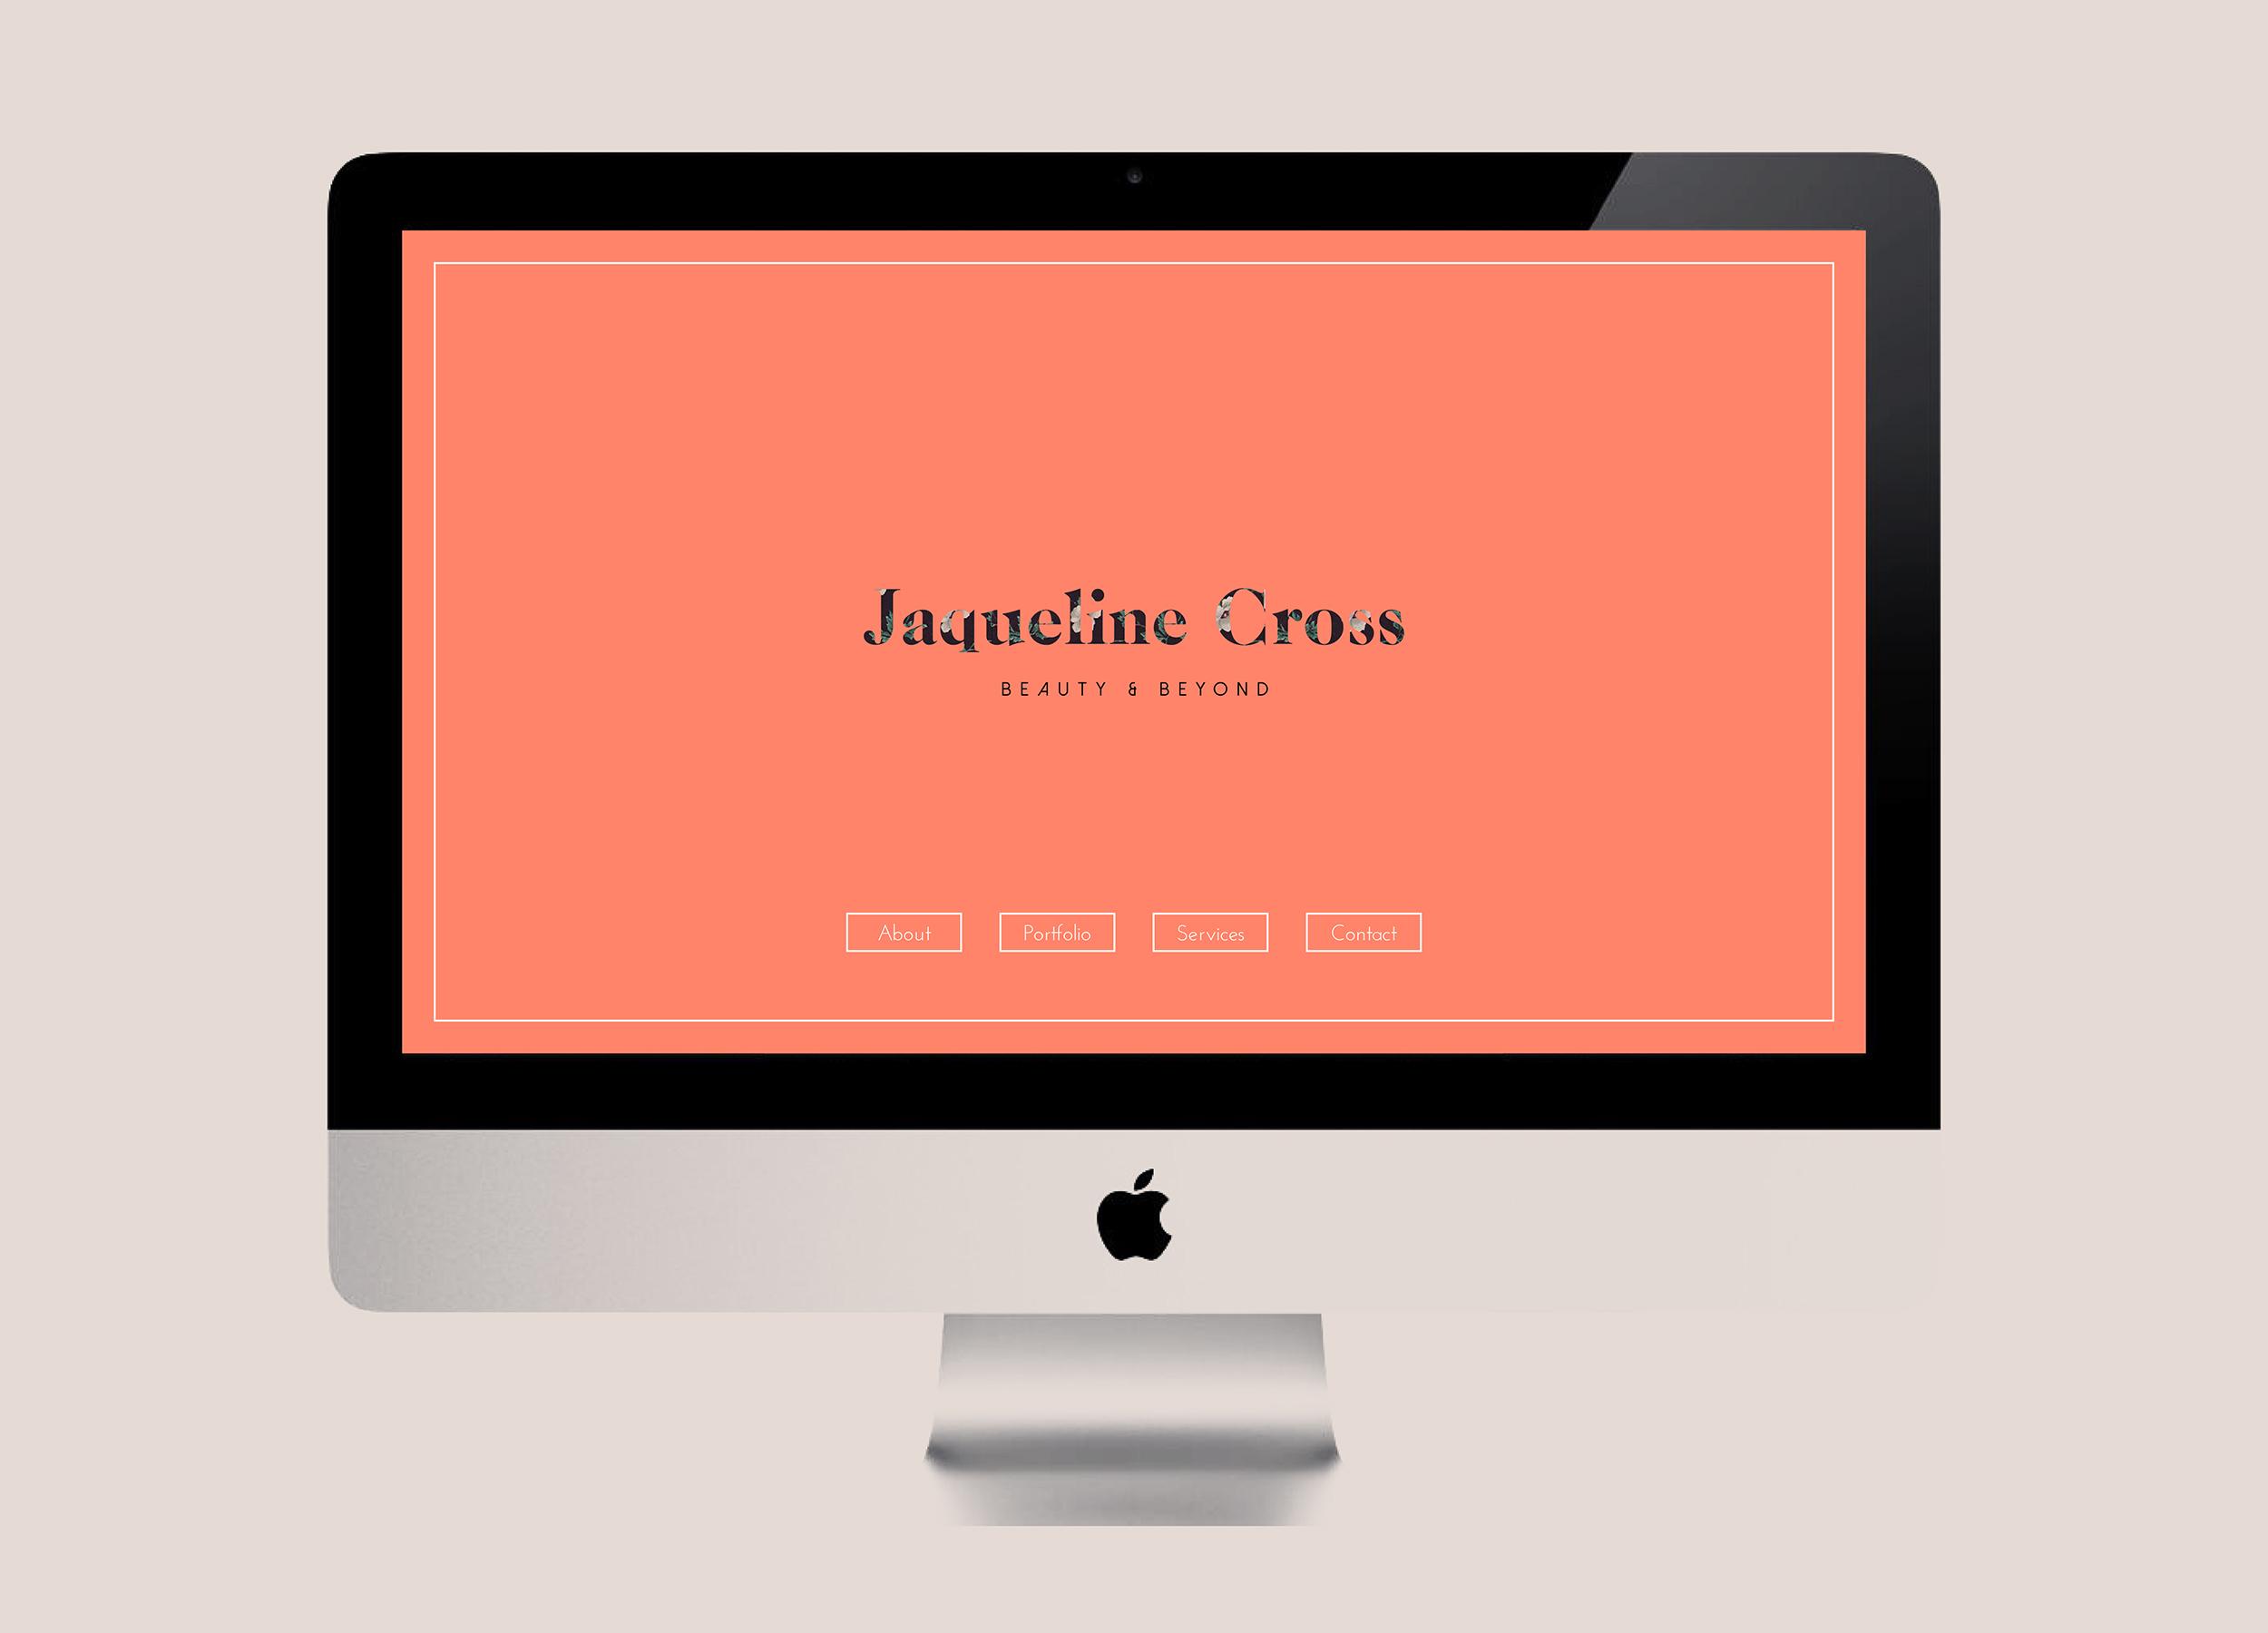 CANOPY_Jaqueline Cross_Website Design